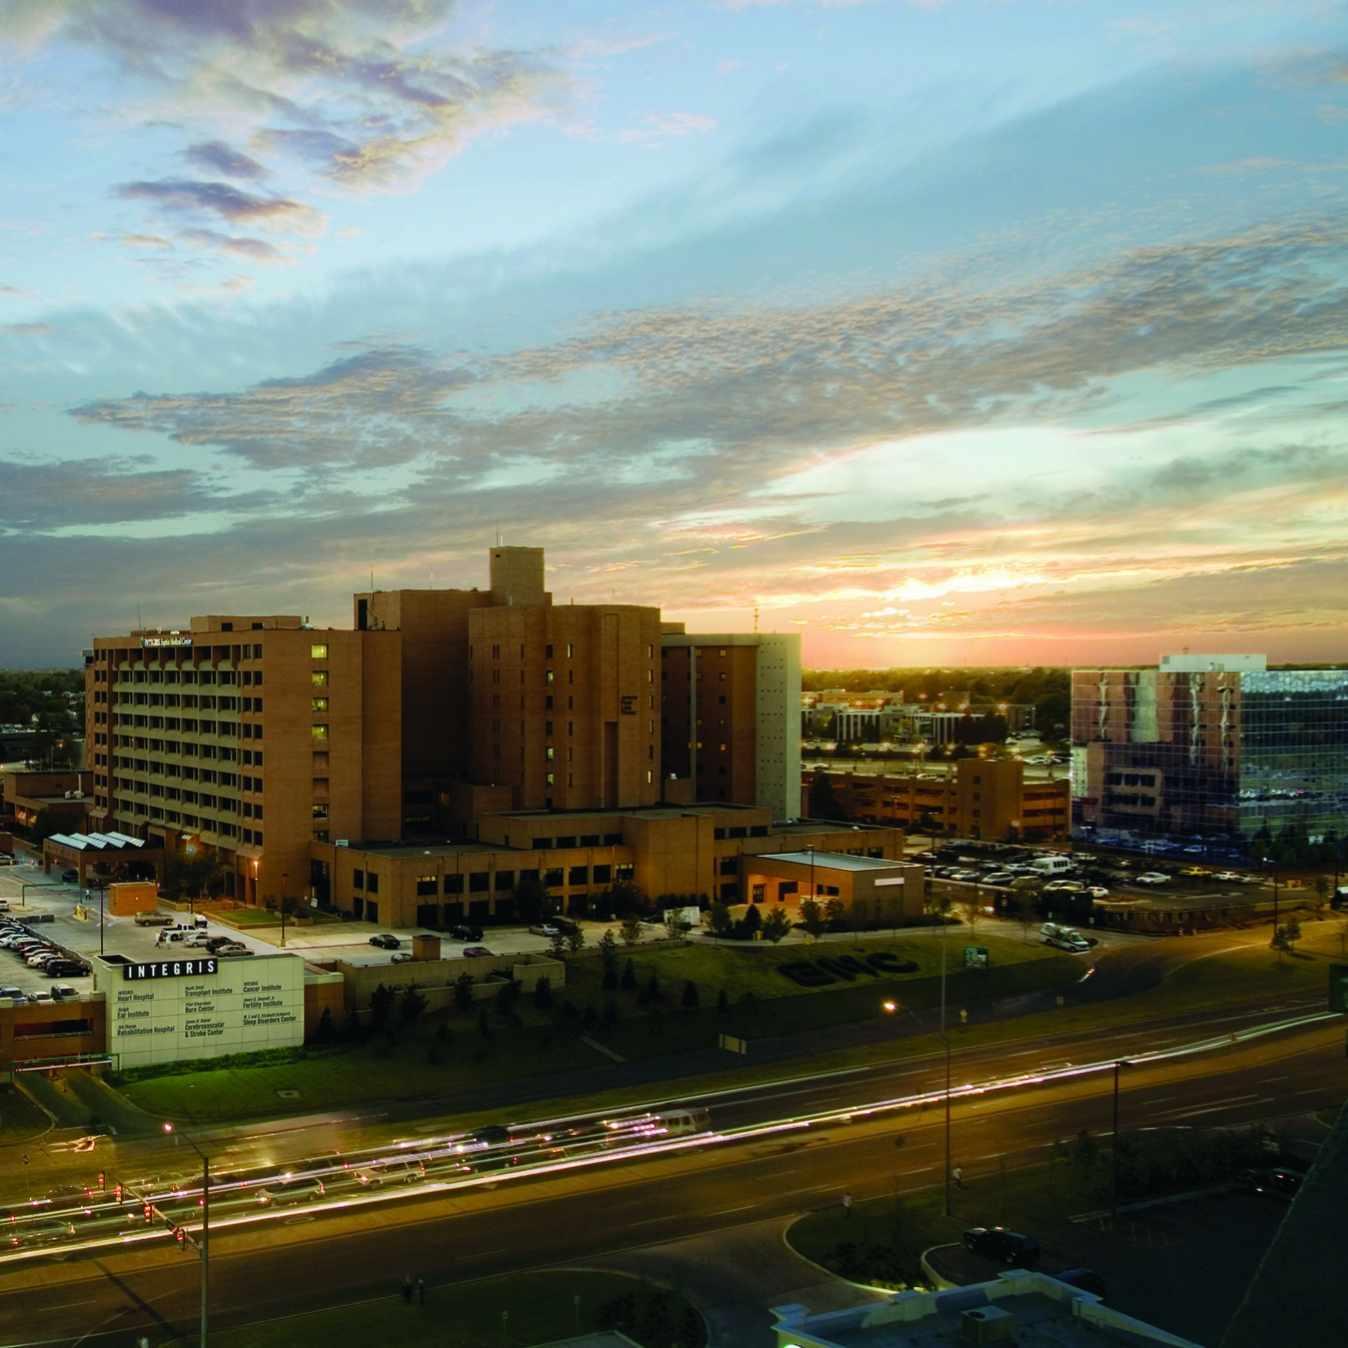 Beauty Shot of the INTEGRIS Baptist Medical Center